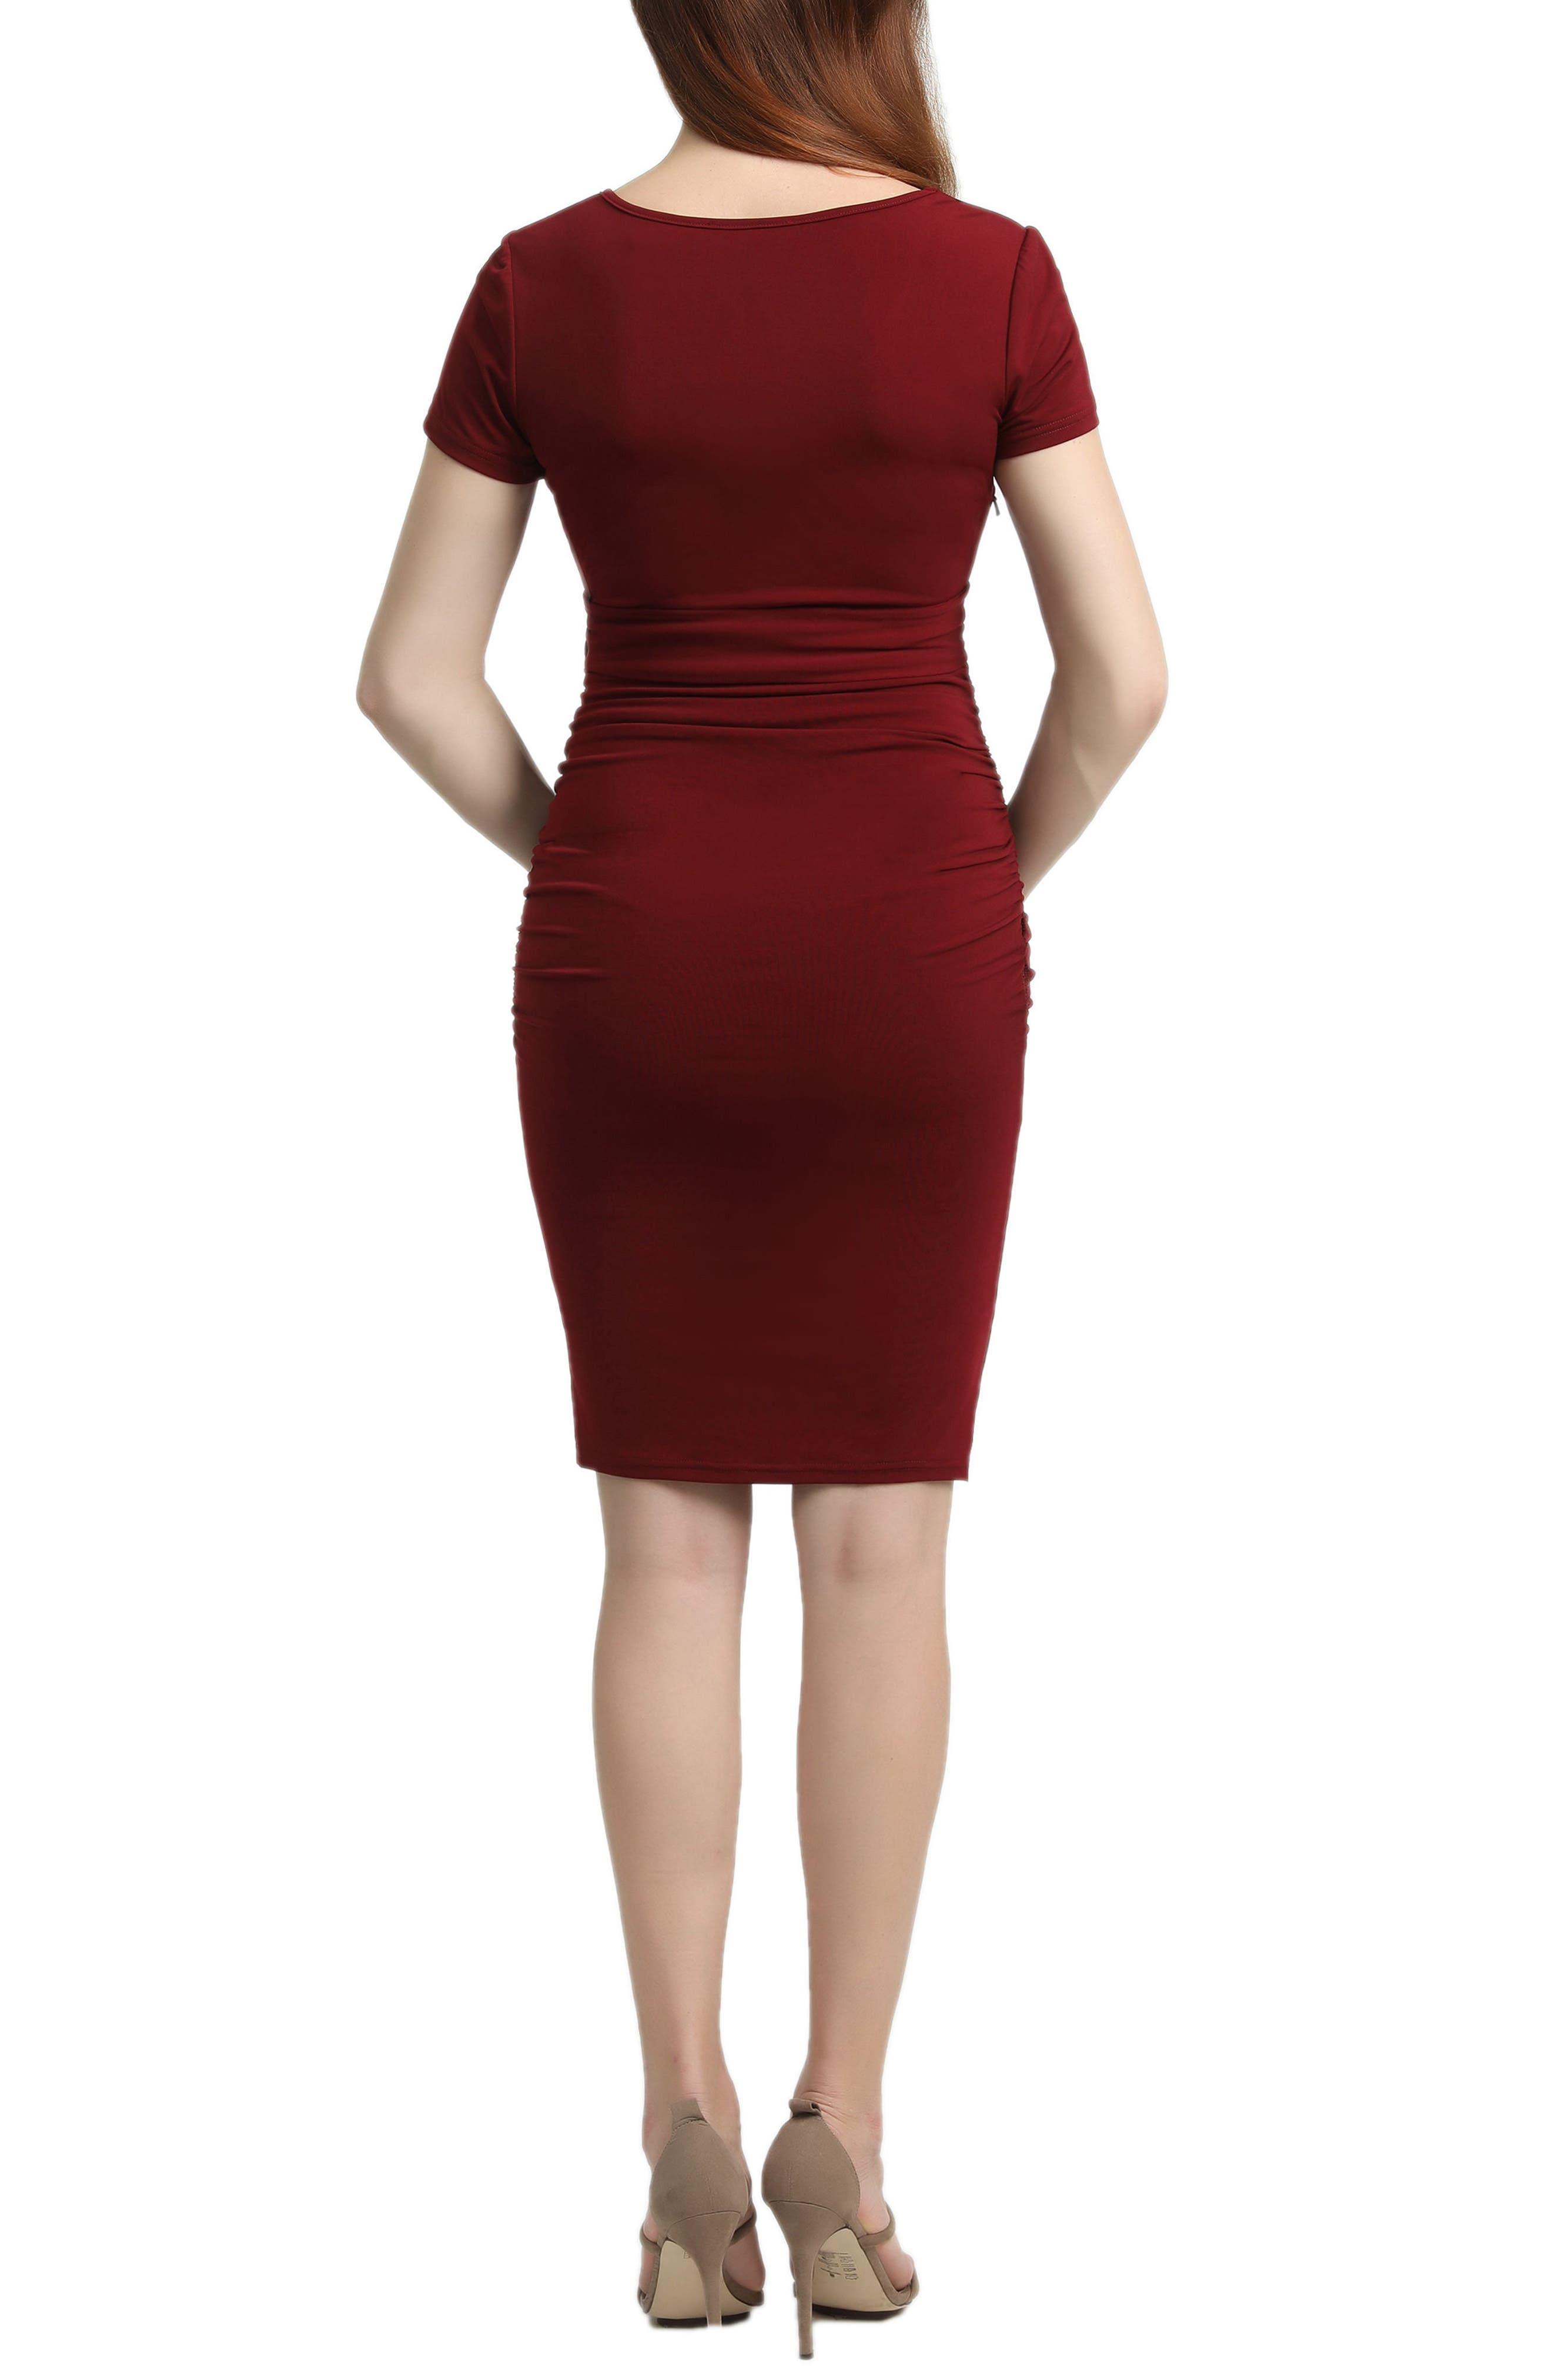 KIMI AND KAI, Lana Ruched Maternity Dress, Alternate thumbnail 2, color, WINE